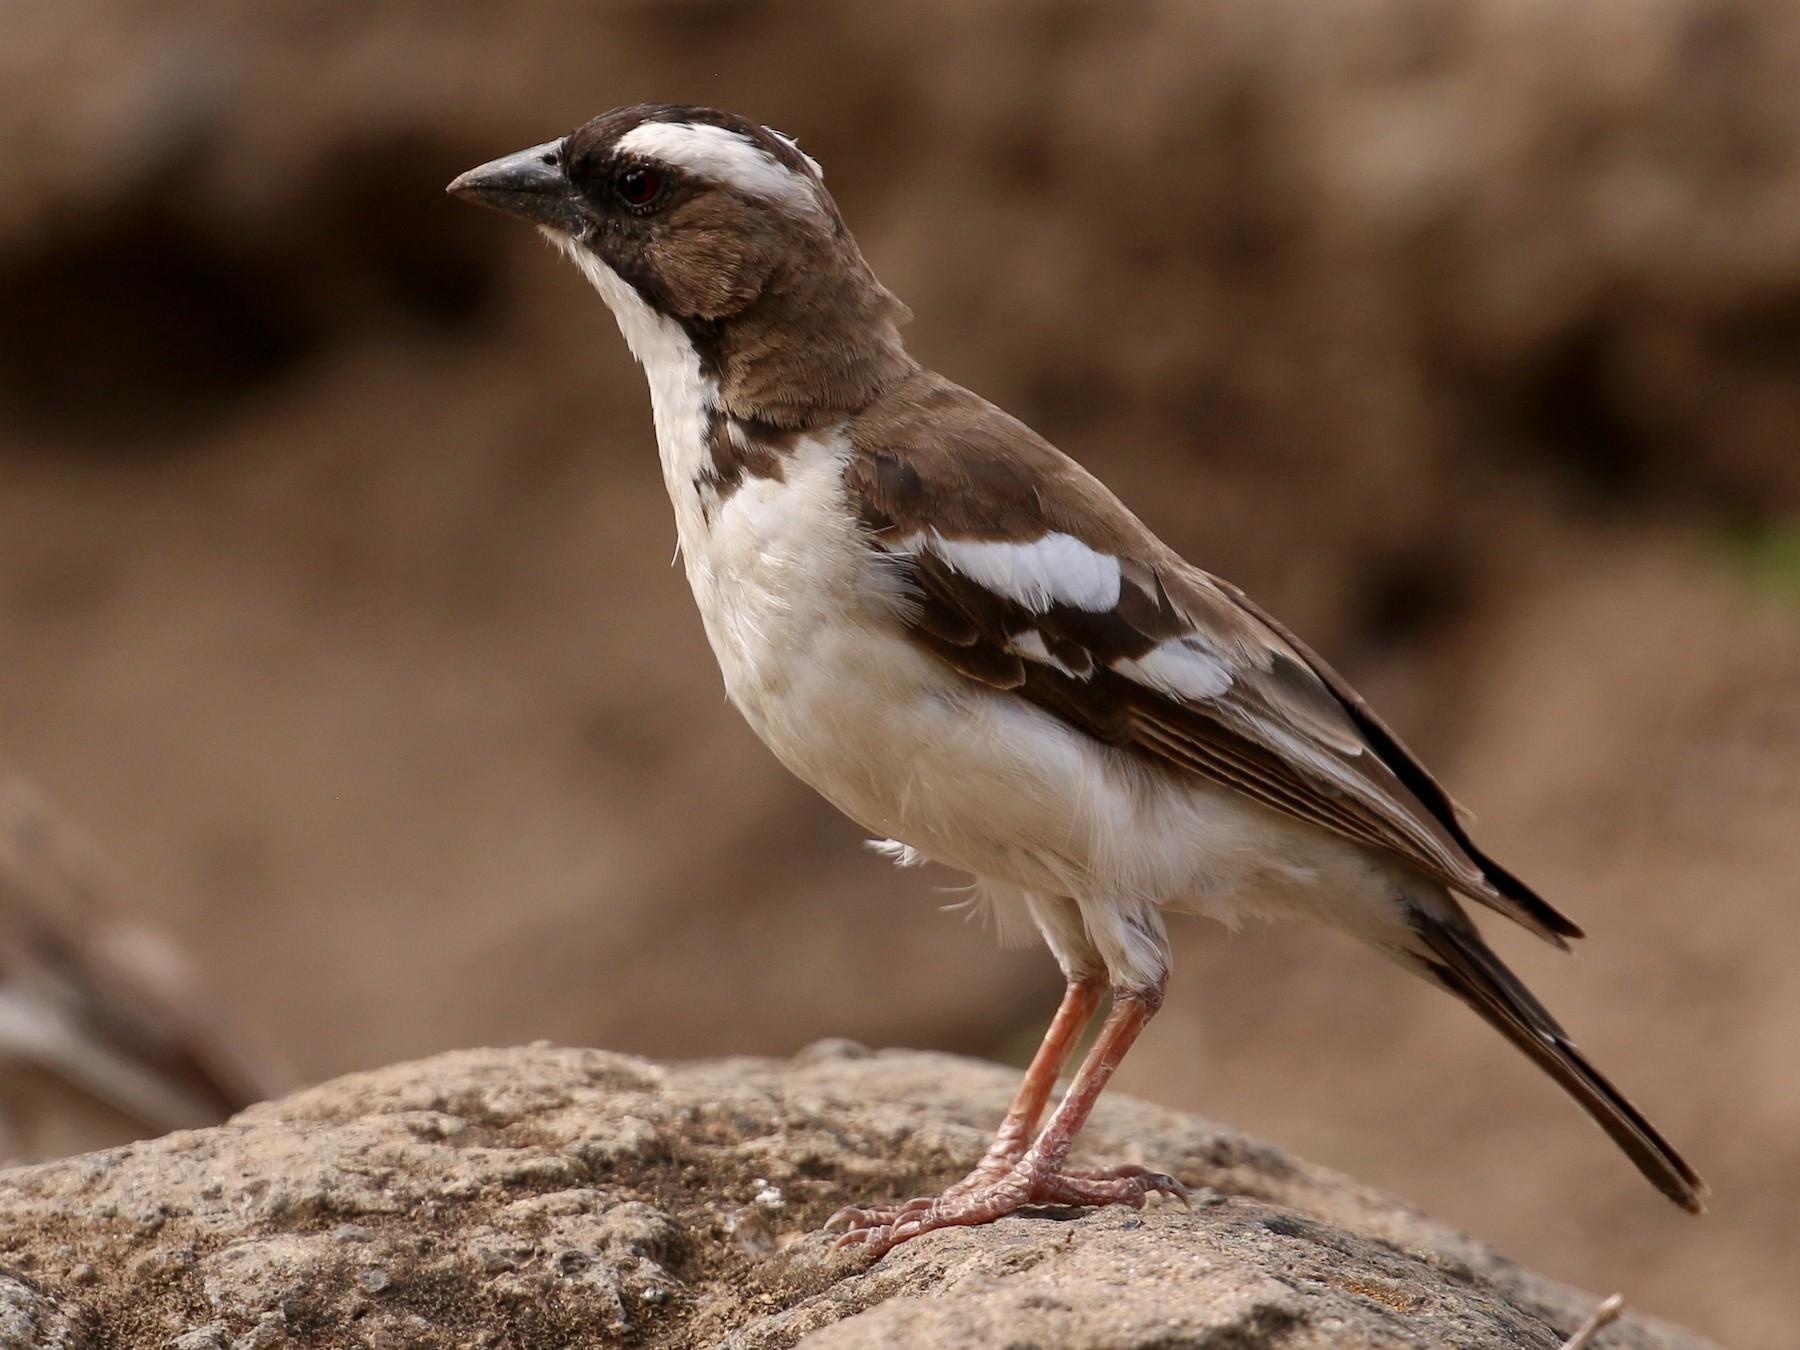 White-browed Sparrow-Weaver - Tommy Pedersen